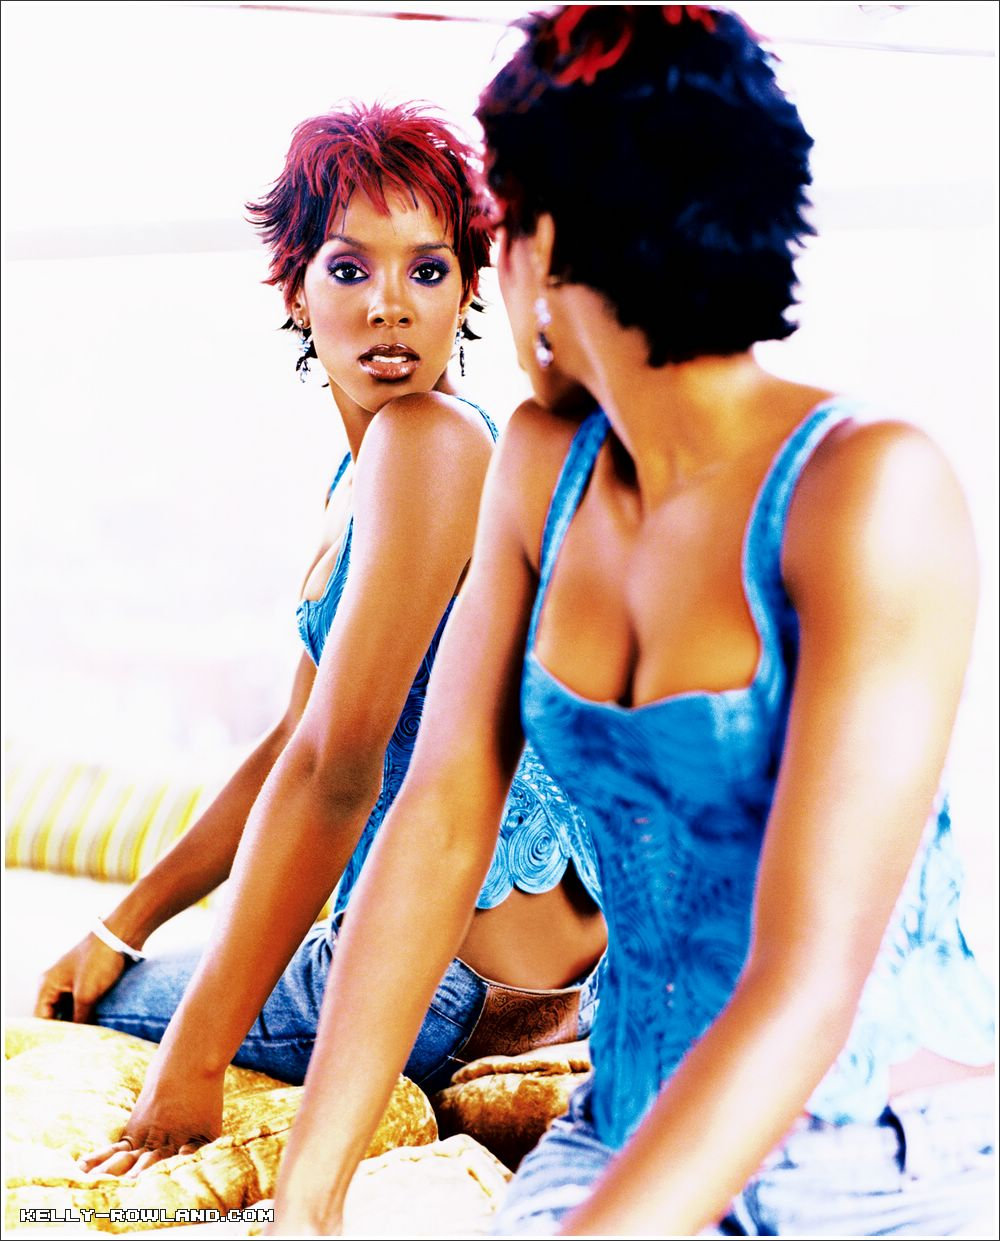 Digitalminx.com - Actresses - Kelly Rowland